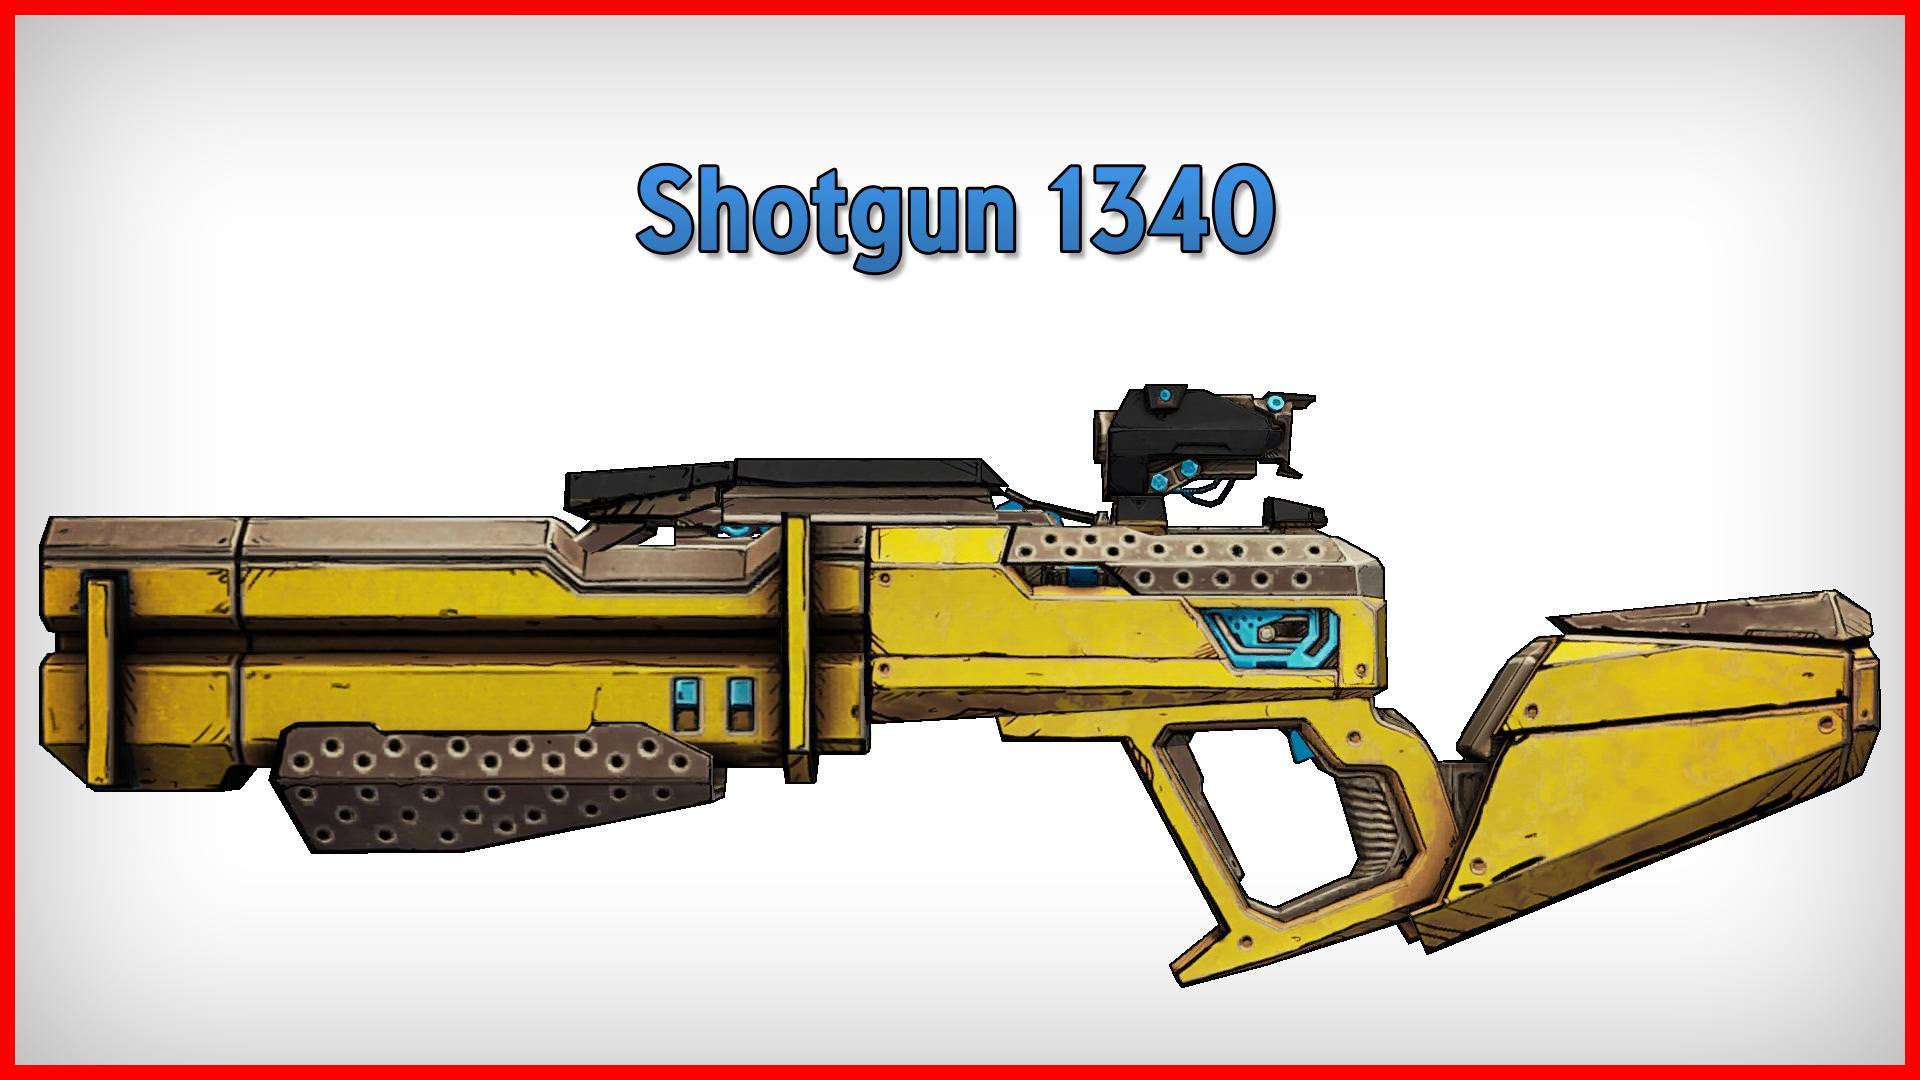 Borderlands 2 shotgun 1340   Bug with the 1340 shotgun